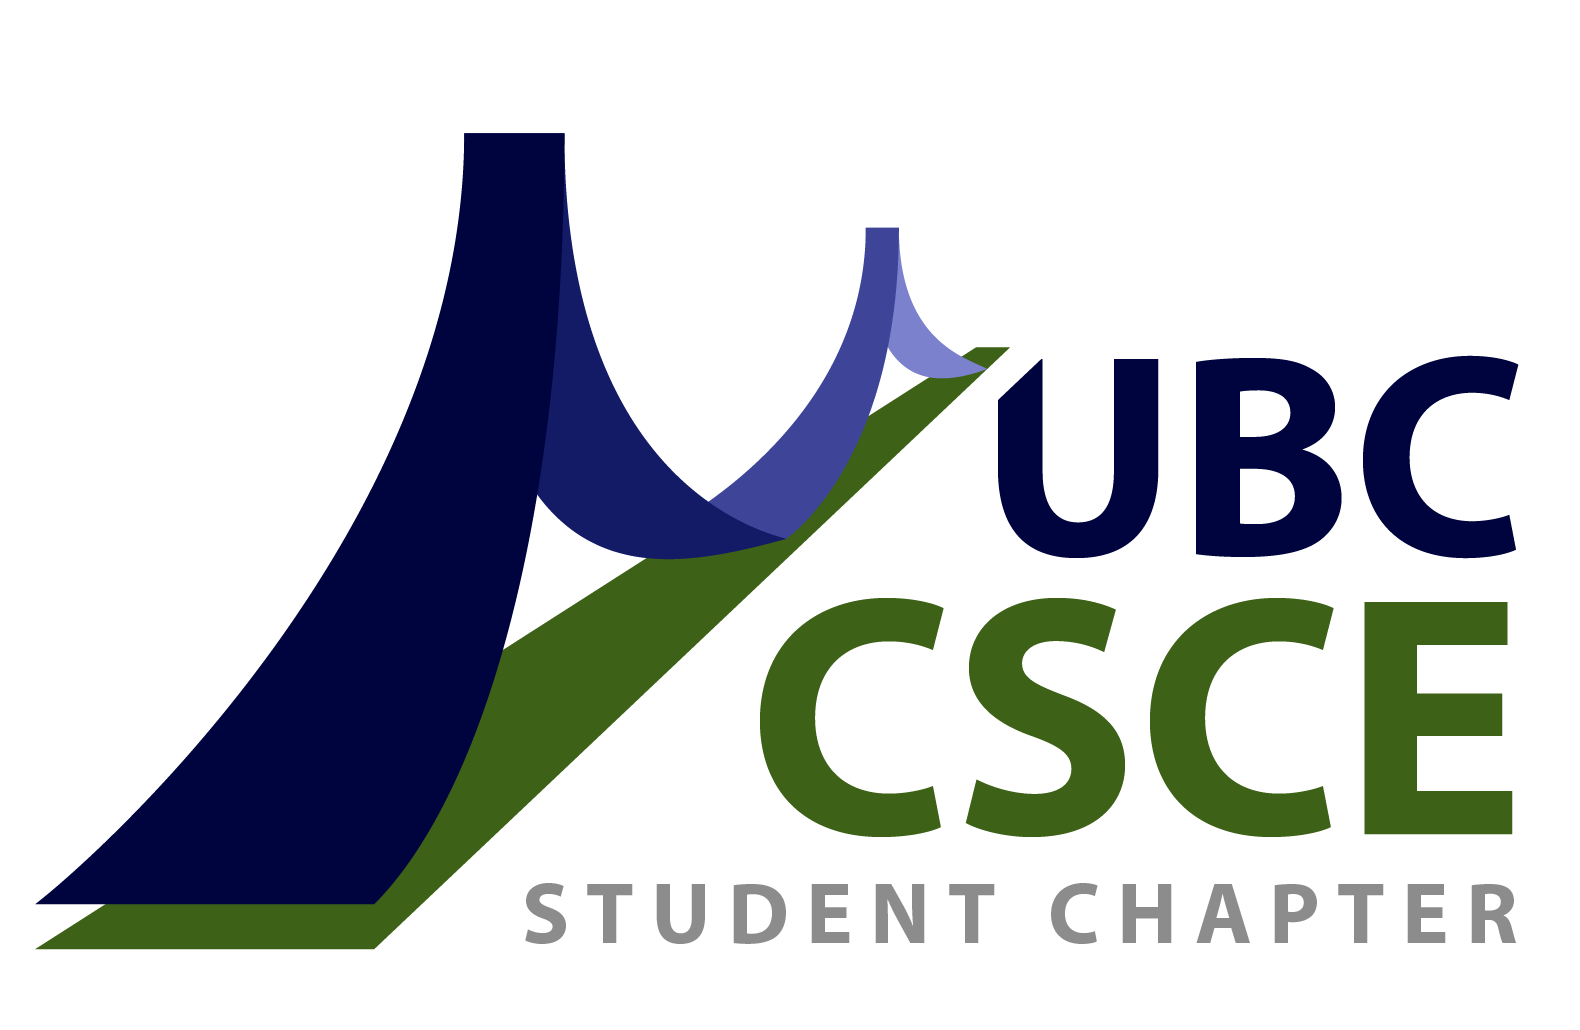 ubc-csce-brand-identity-colour-1